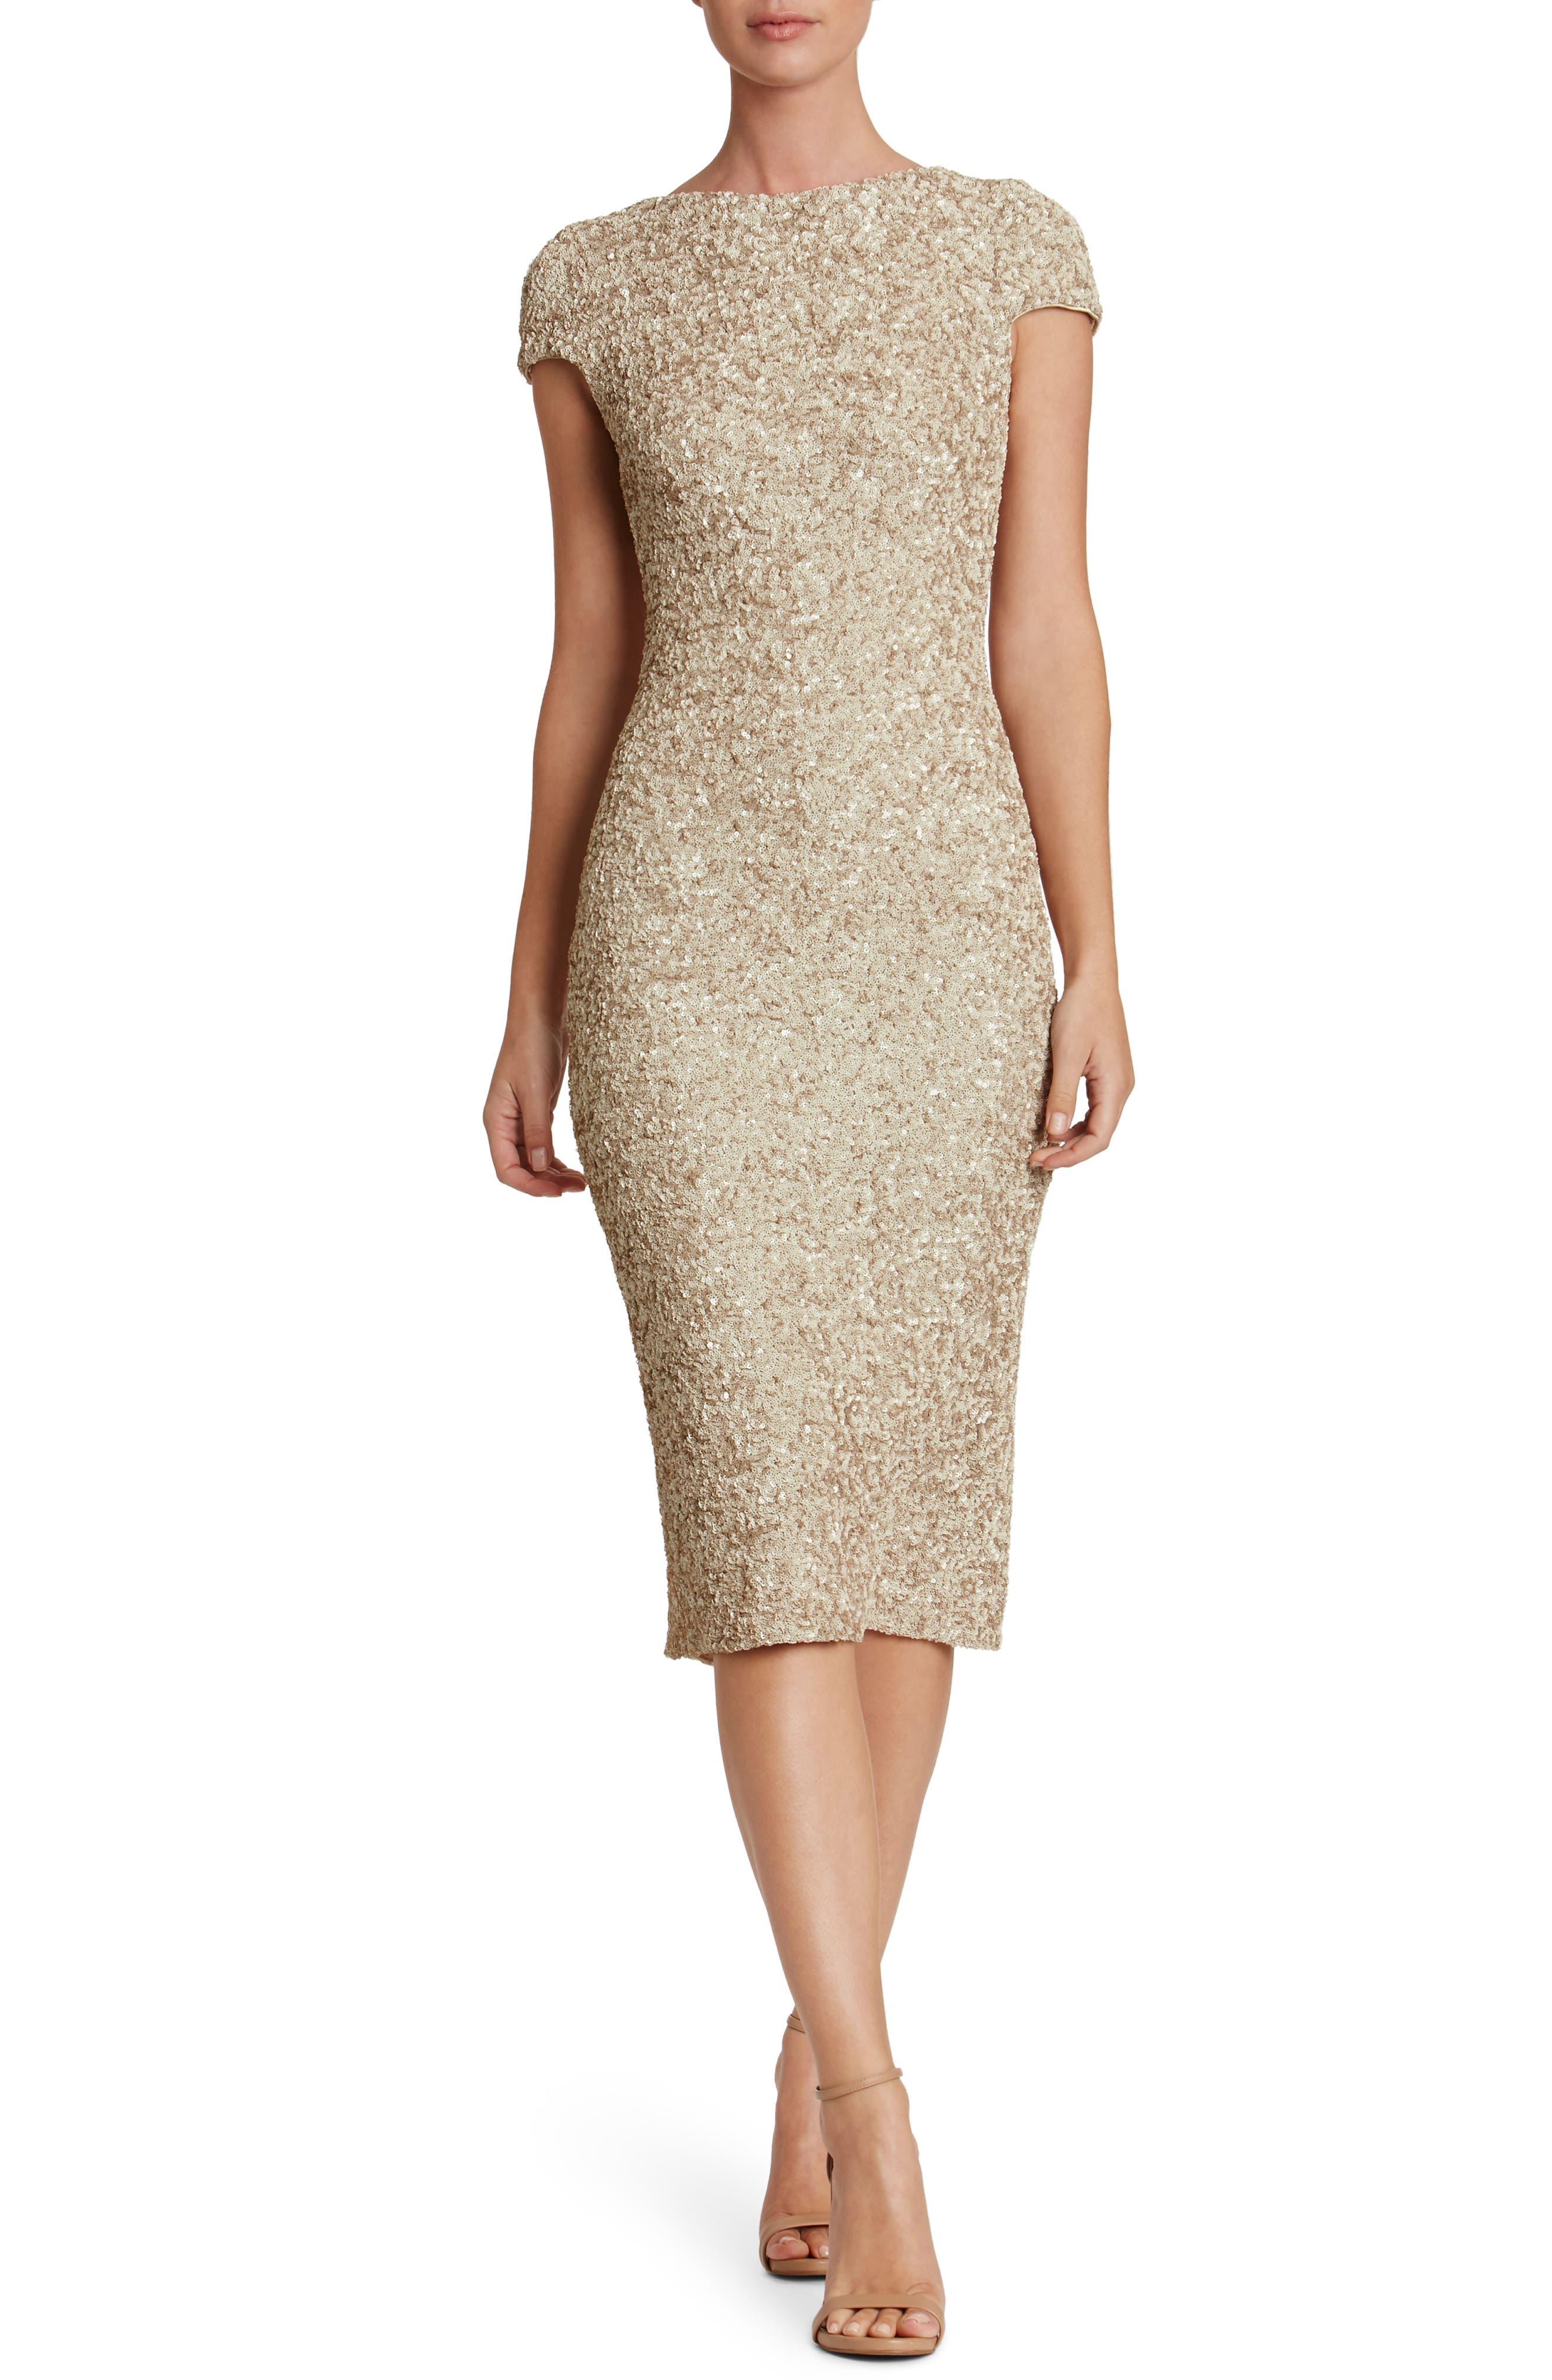 Main Image - Dress the Population Marcella Sequin Midi Dress